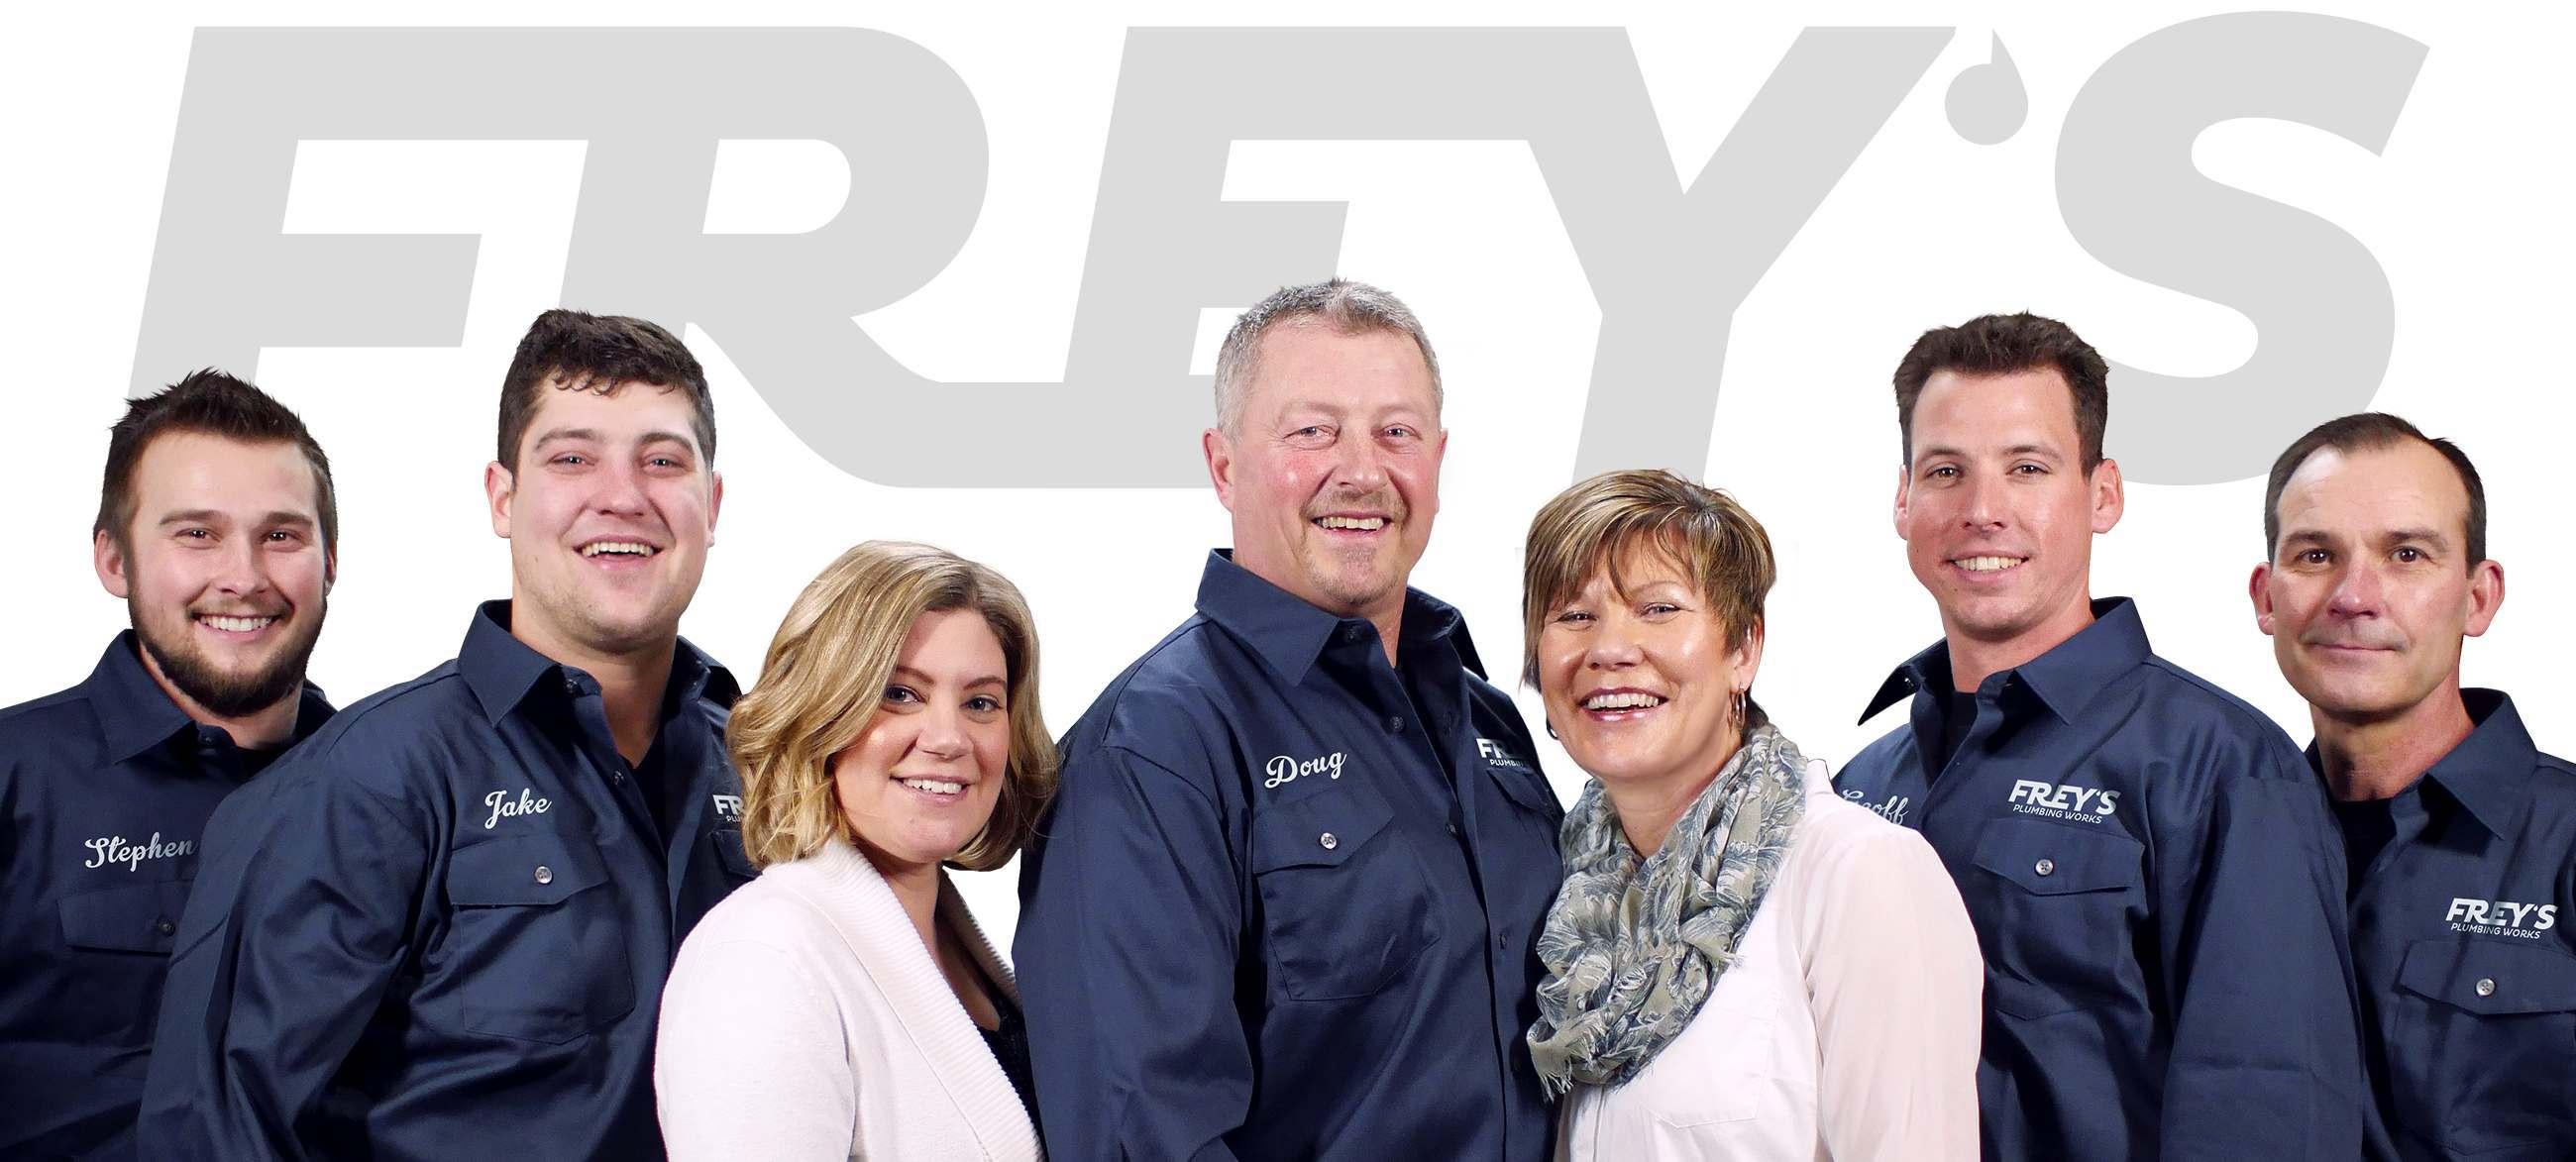 Frey's Water Softener Team